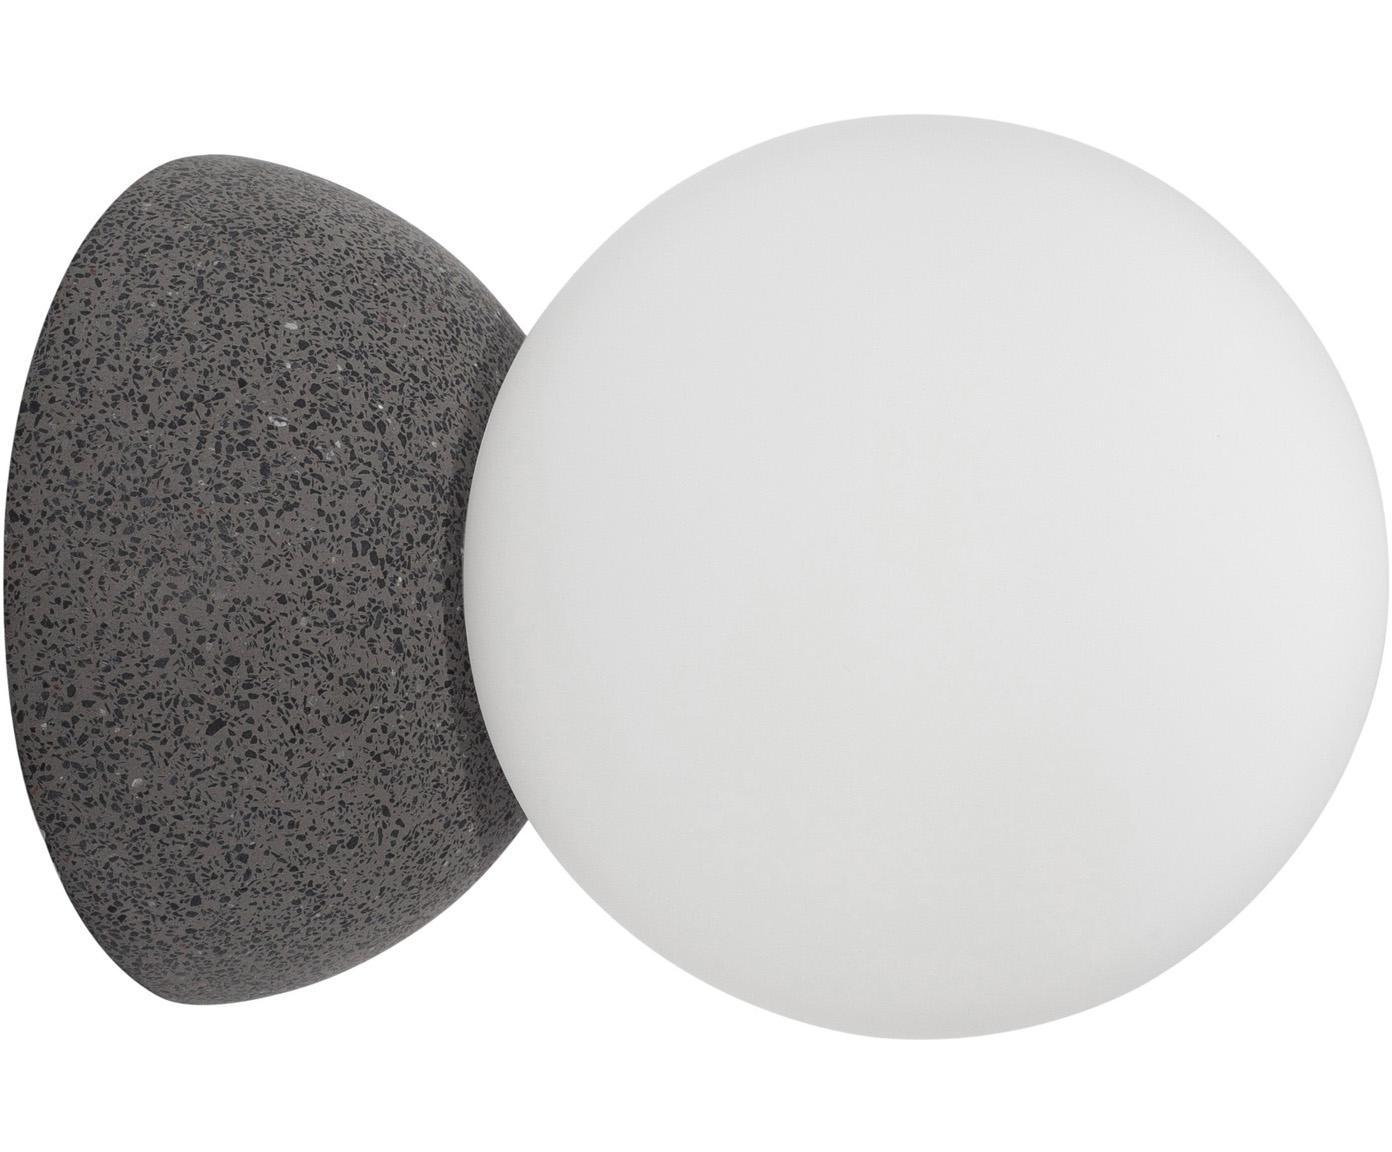 Wandleuchte Zero aus Opalglas, Lampenschirm: Opalglas, Grau, Weiß, Ø 10 x T 14 cm